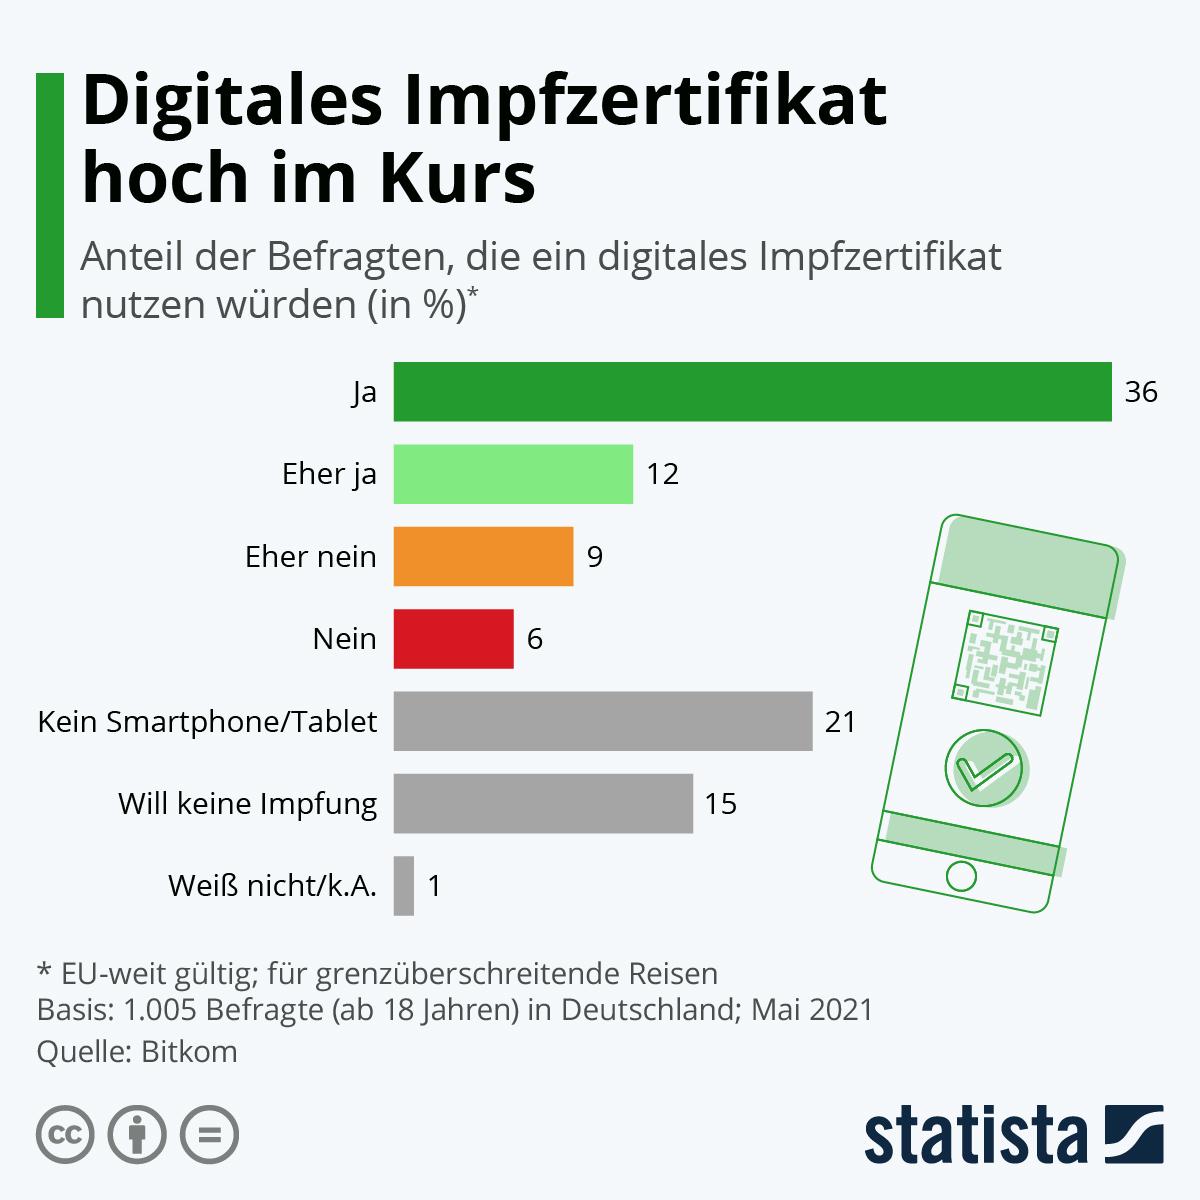 Infografik Digitales Impfzertifikat Hoch Im Kurs Statista